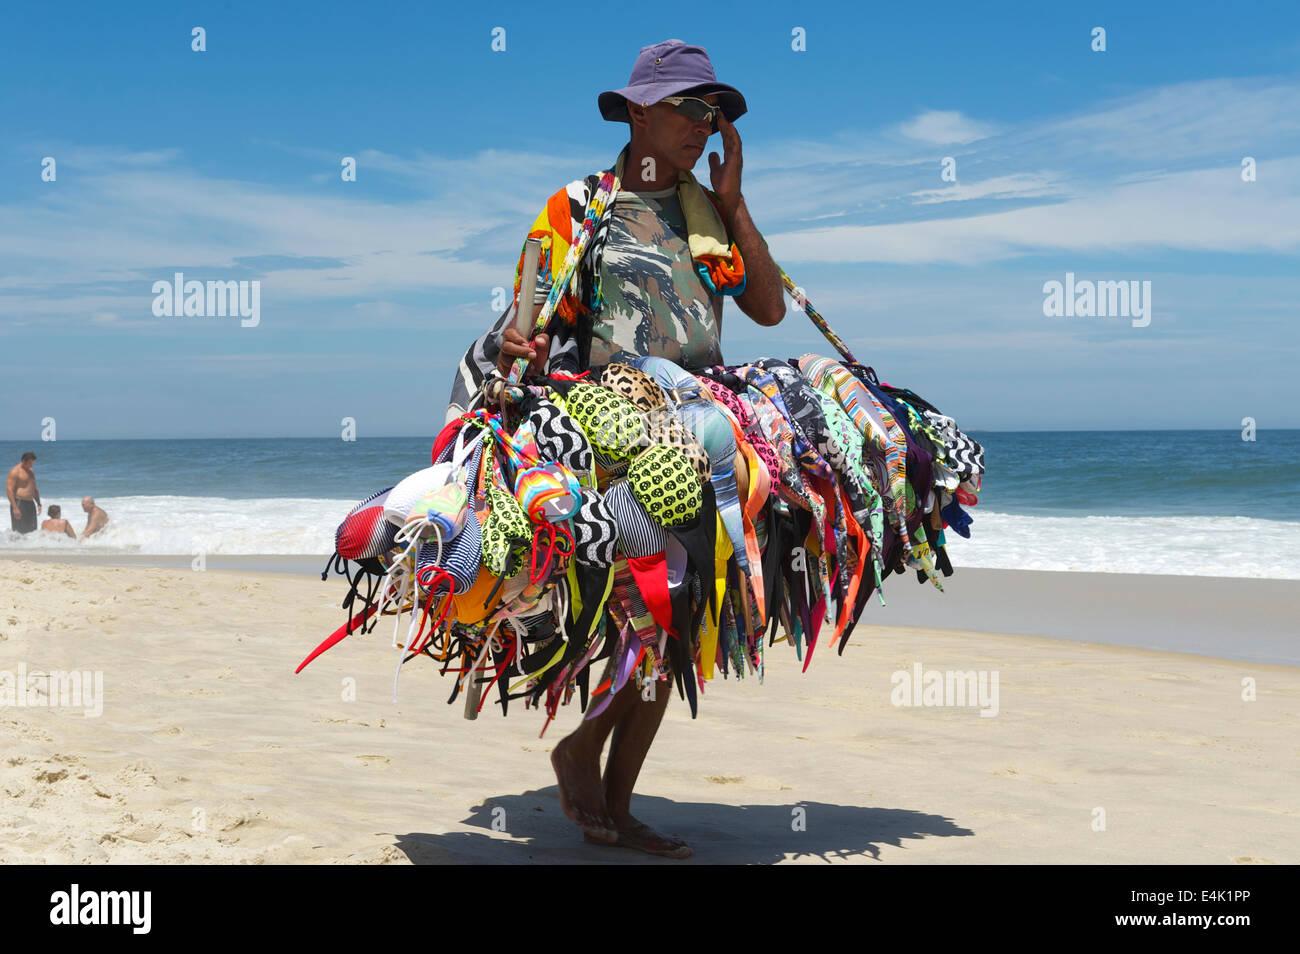 RIO DE JANEIRO, BRAZIL - MARCH, 2013: A beach vendor selling bikinis carries his merchandise along Ipanema Beach. - Stock Image